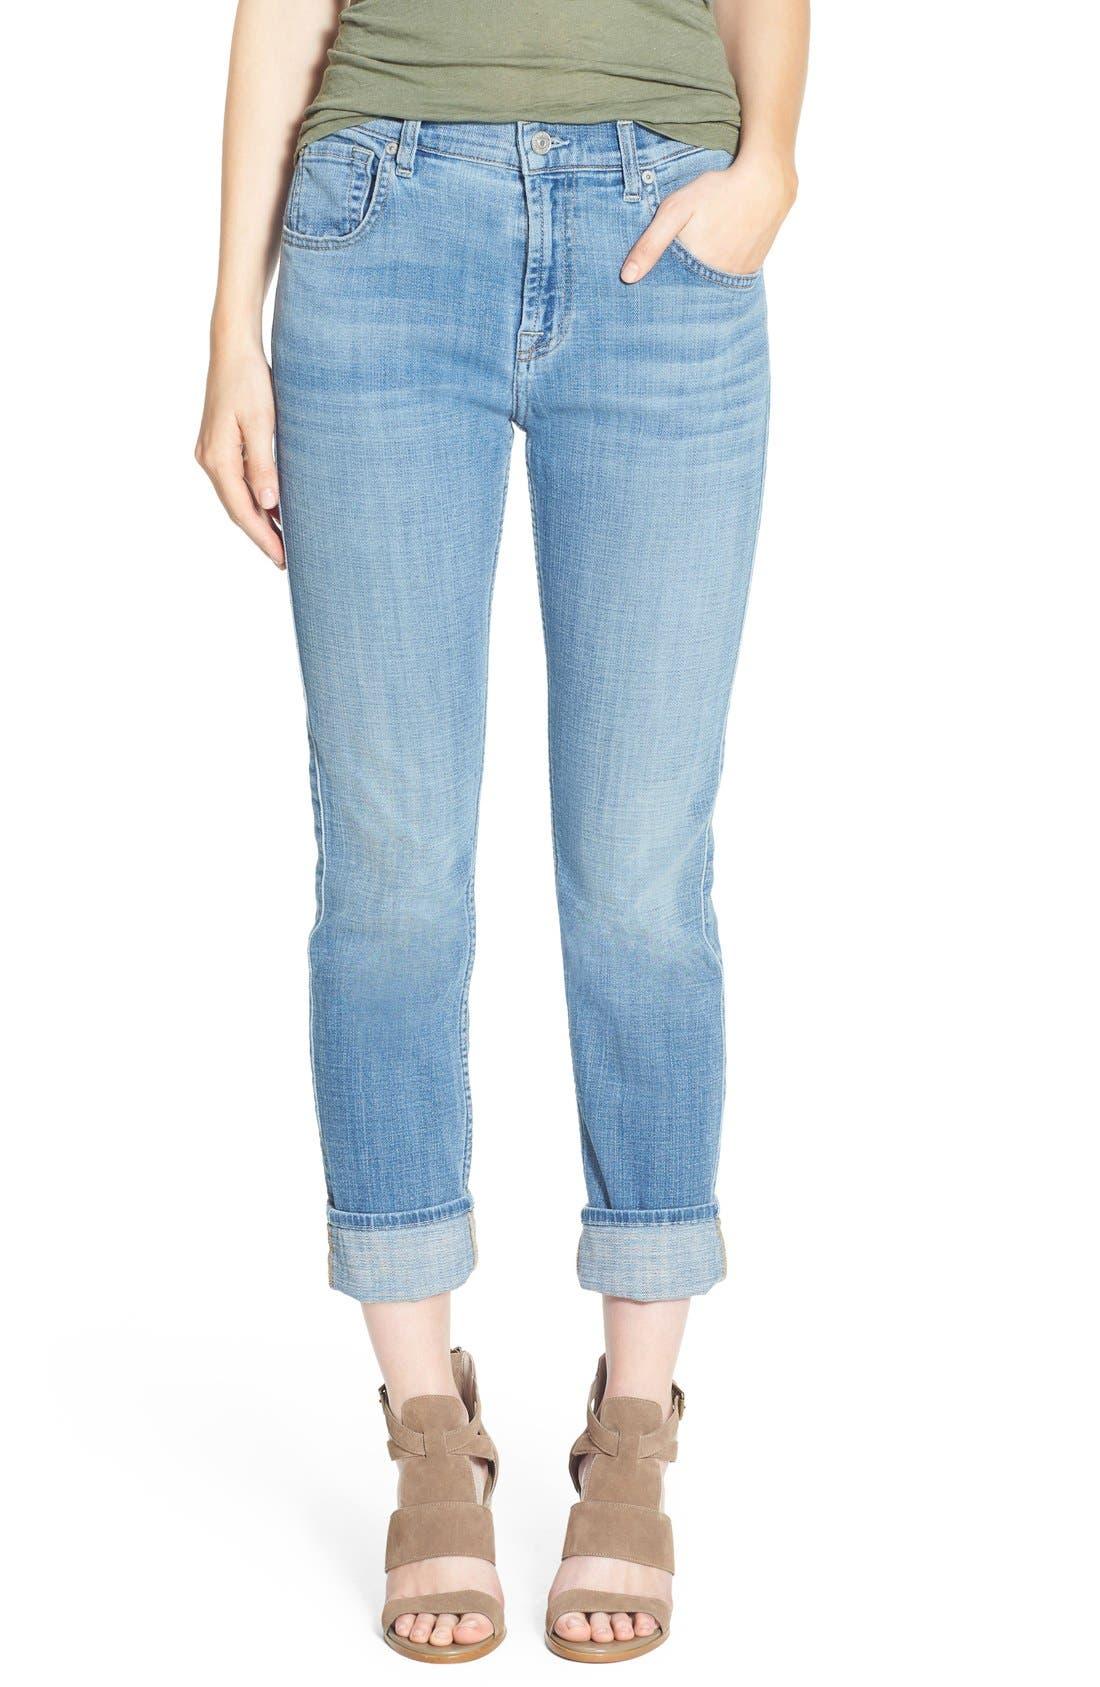 Main Image - 7 For All Mankind® 'Josefina' Relaxed Skinny Jeans (Medium Broken Twill)